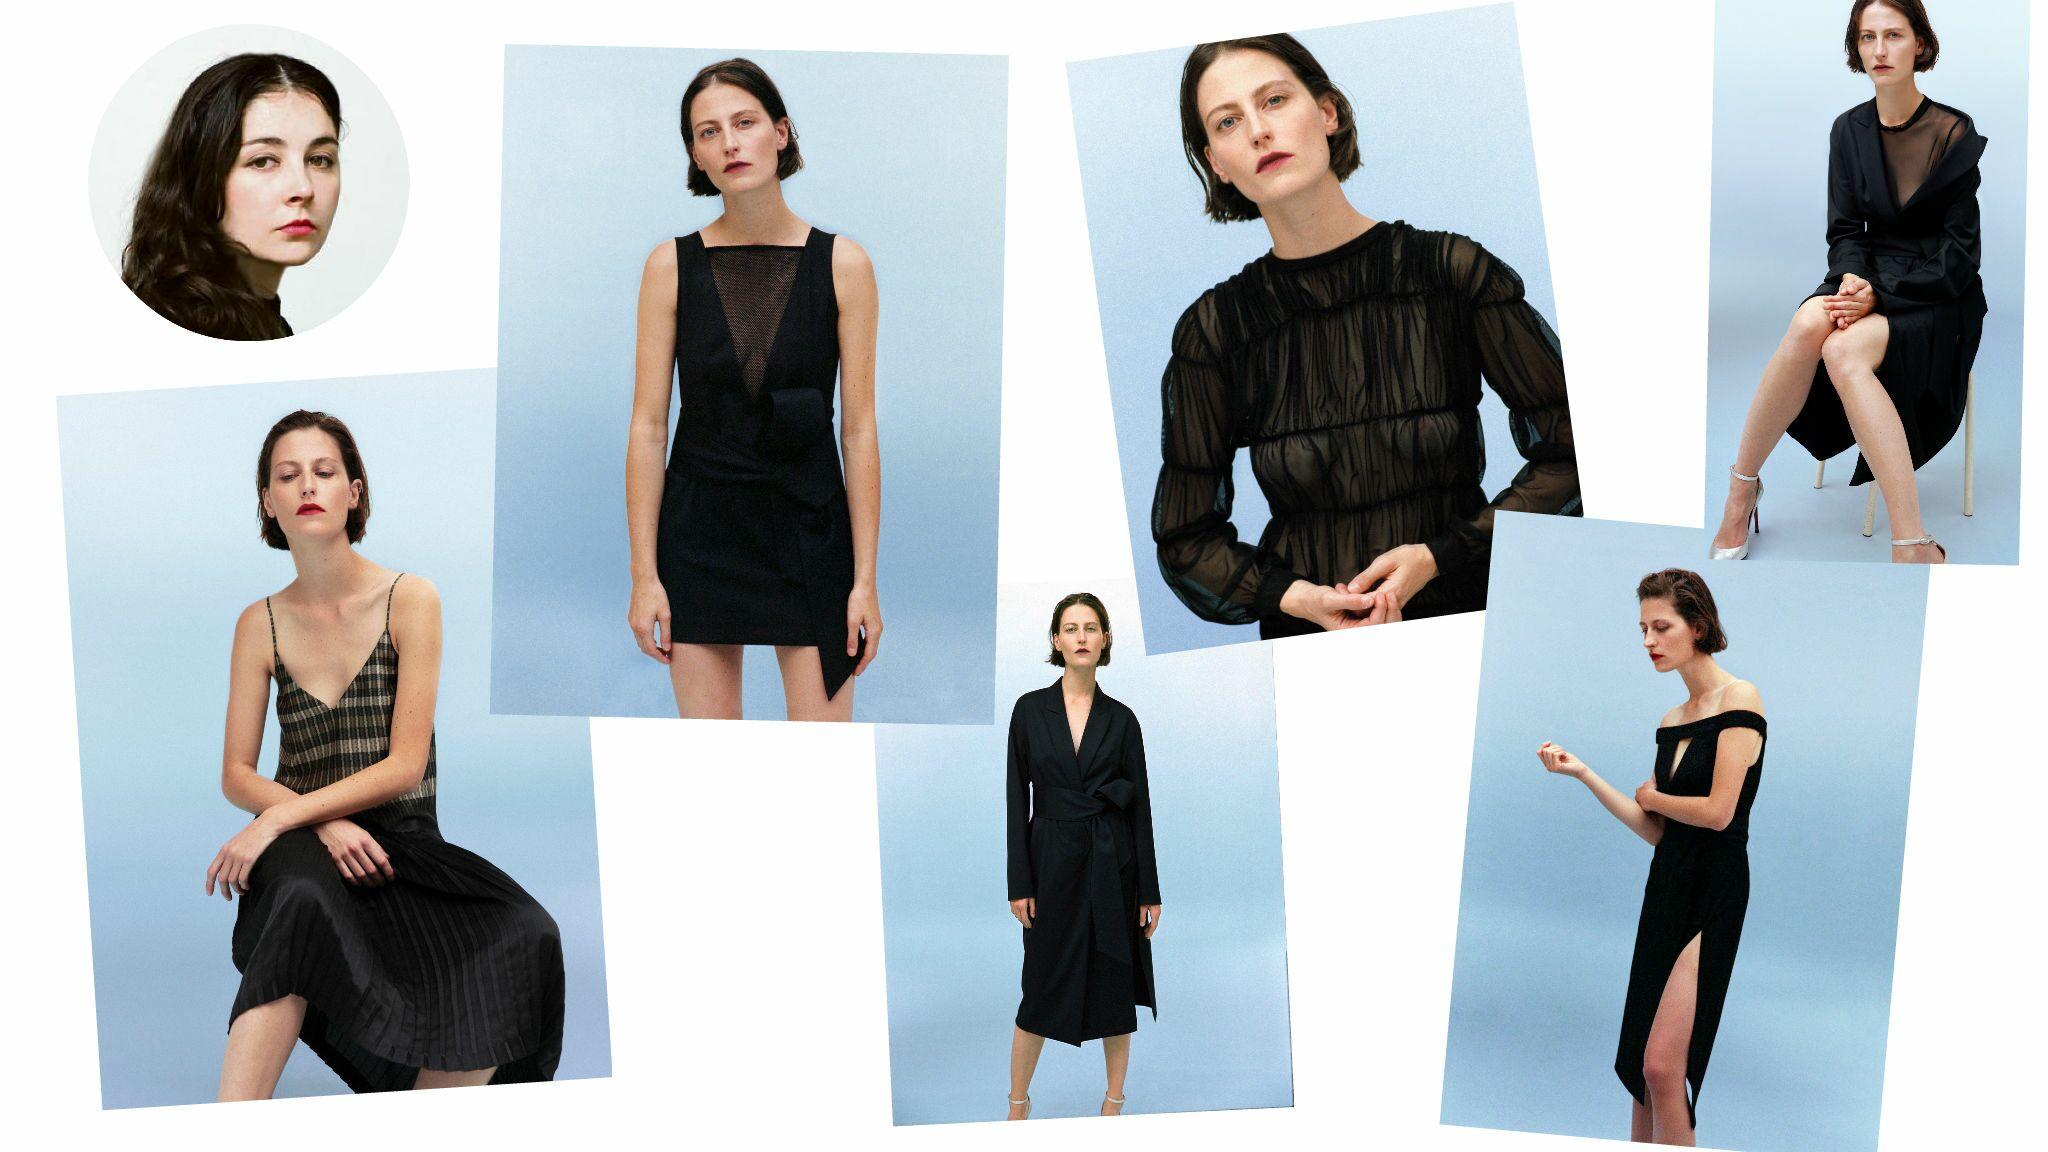 Lea Peckre Reinvente La Petite Robe Noire Pour La Redoute Voici